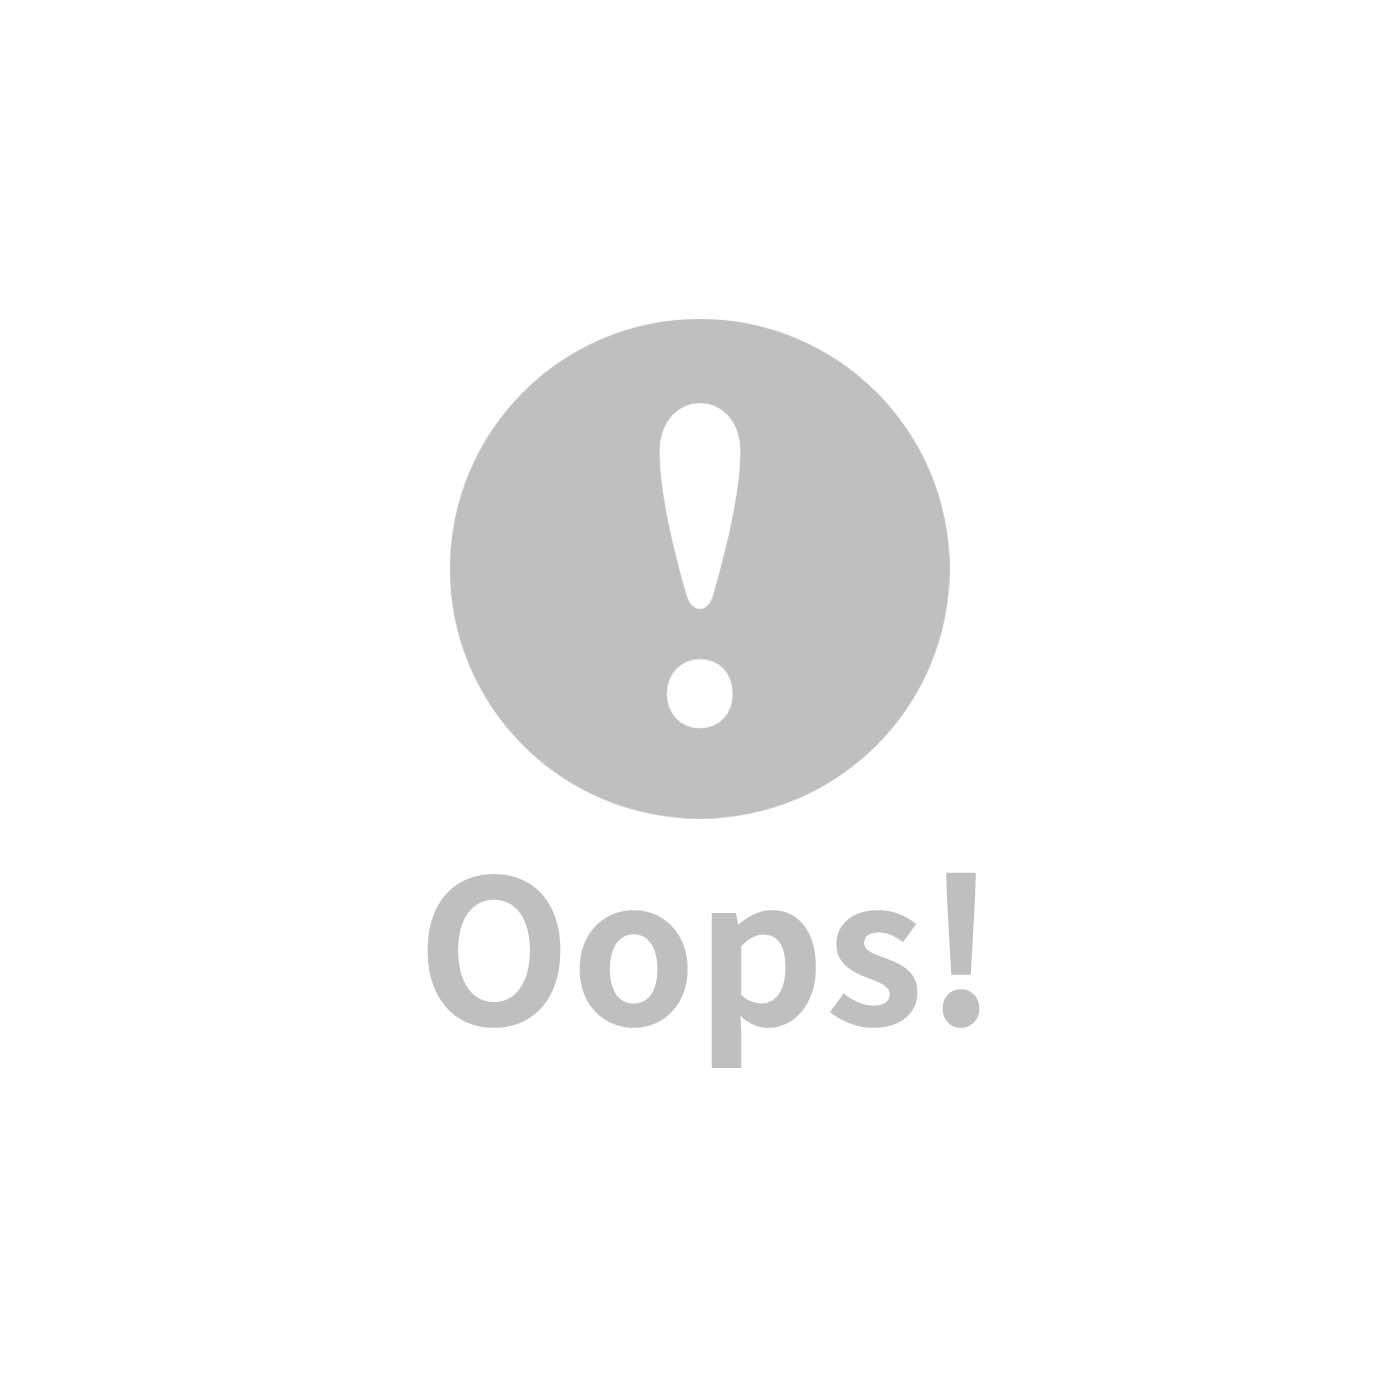 Pacific Baby 美國不鏽鋼保溫太空瓶7oz吸管杯蓋二件組(貼心紅7oz+紅配件組)